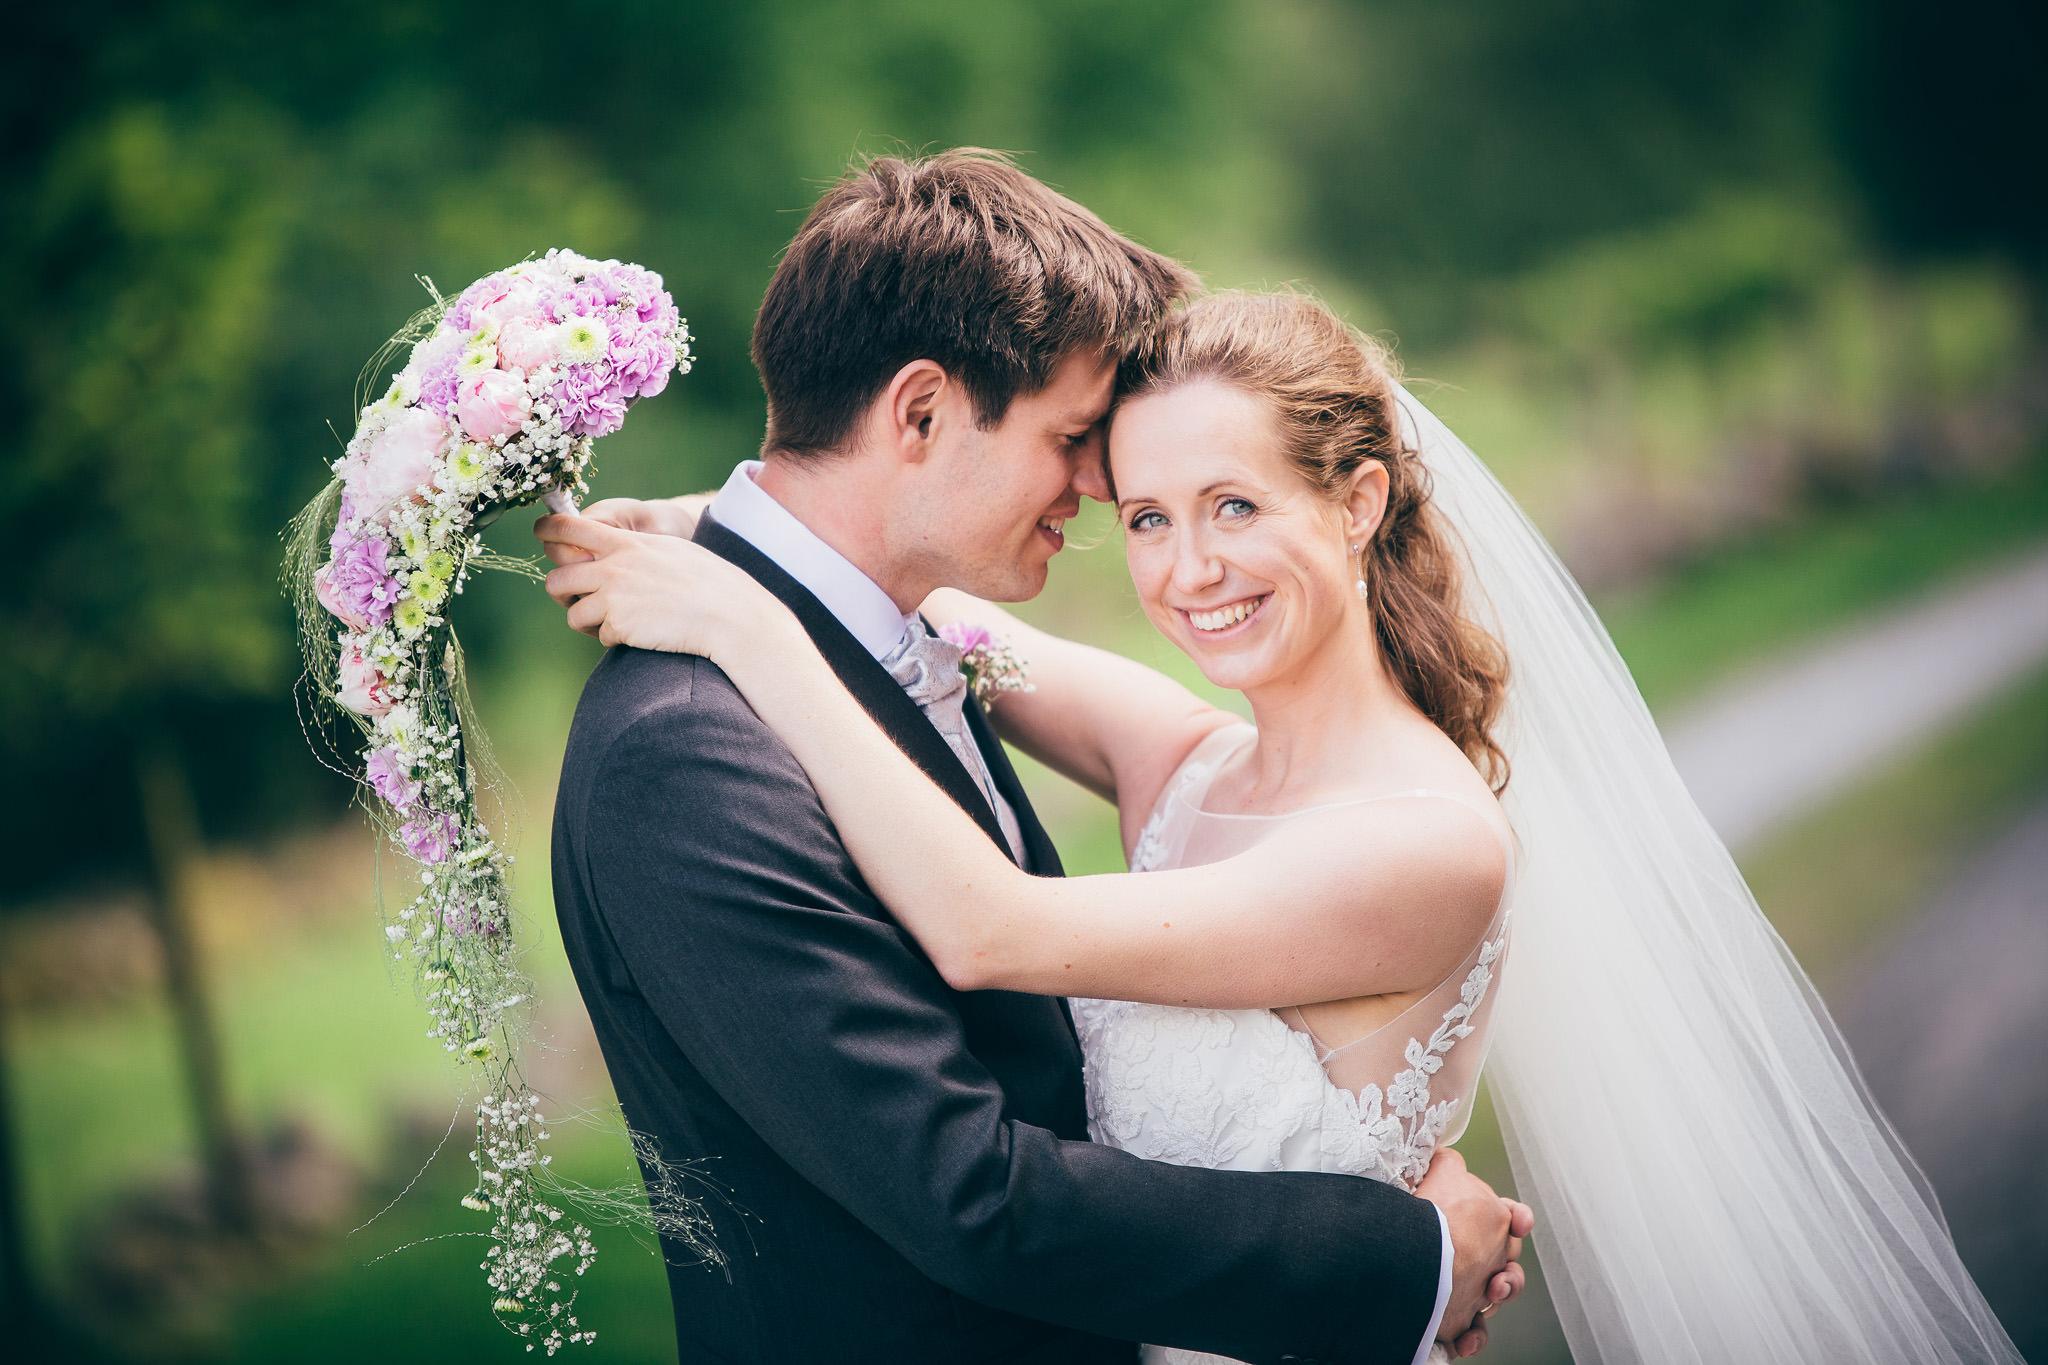 Norway+wedding+photographer+elopement+pre+wedding+Rogaland+bryllupsfotograf+Casey+Arneson-89.jpg